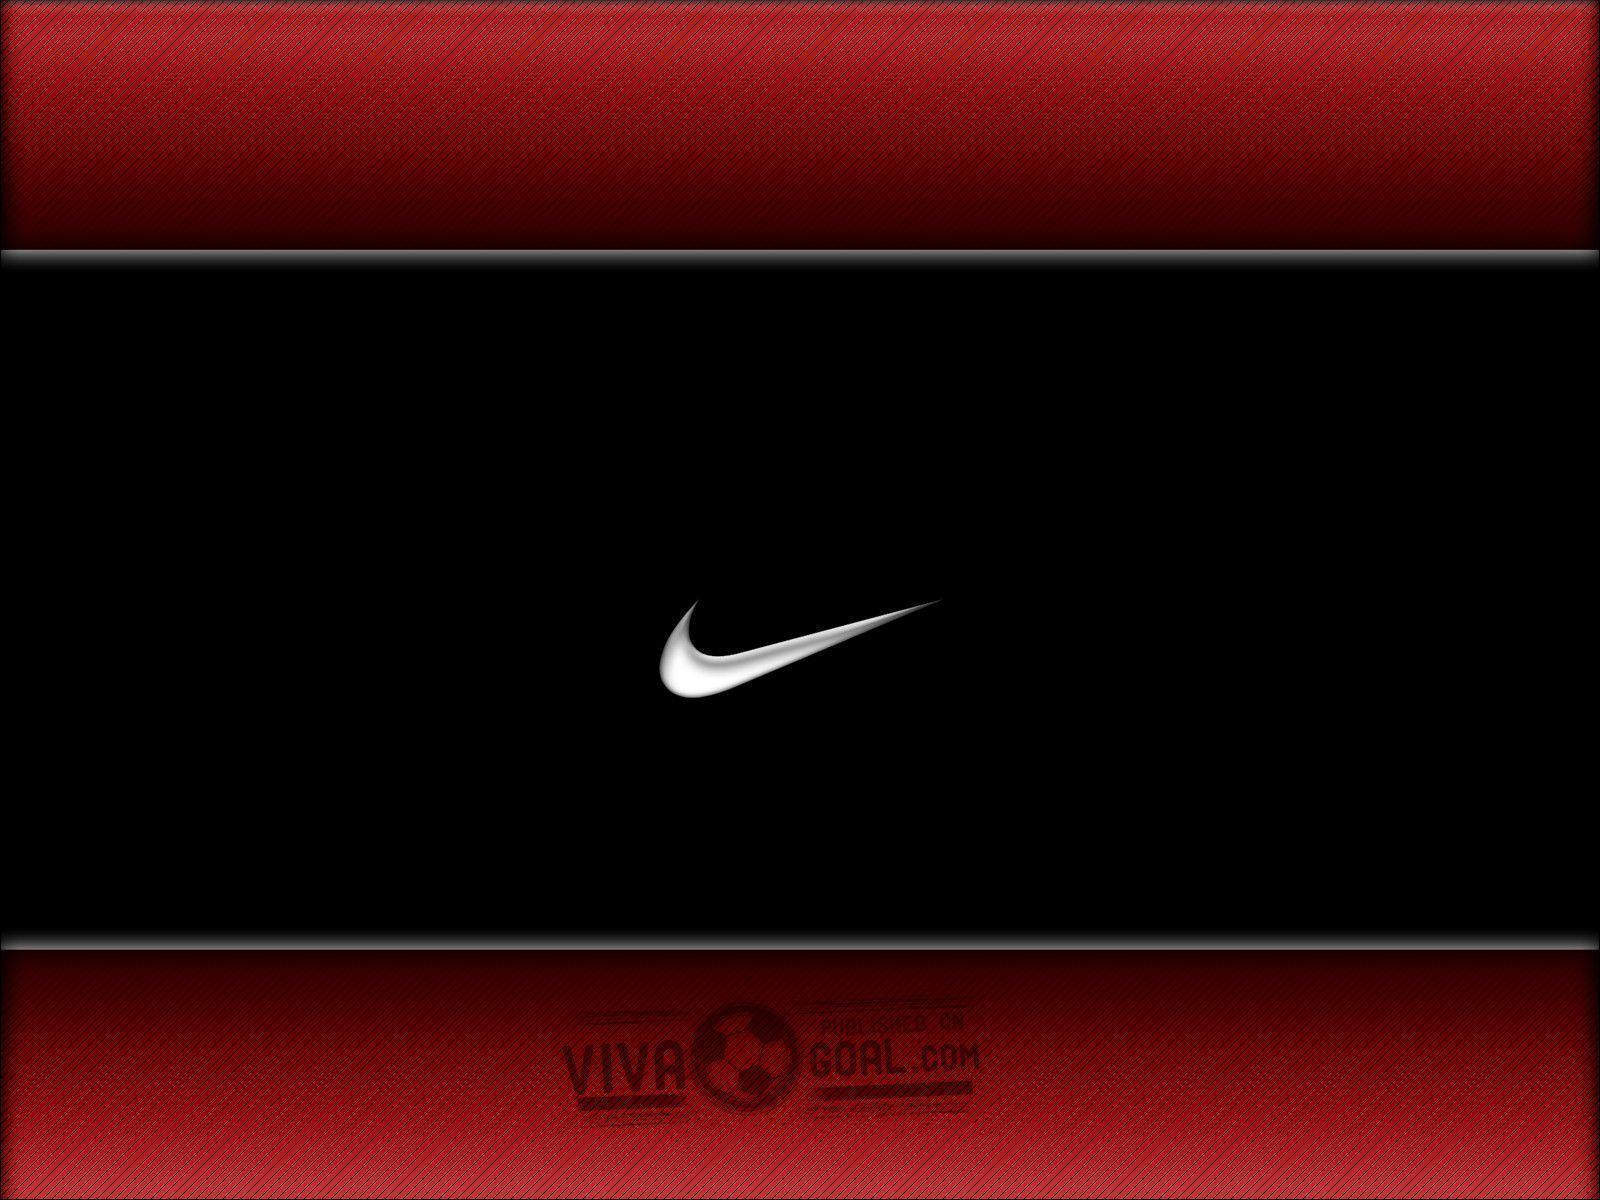 Nike Wallpaper 3 Backgrounds | Wallruru.